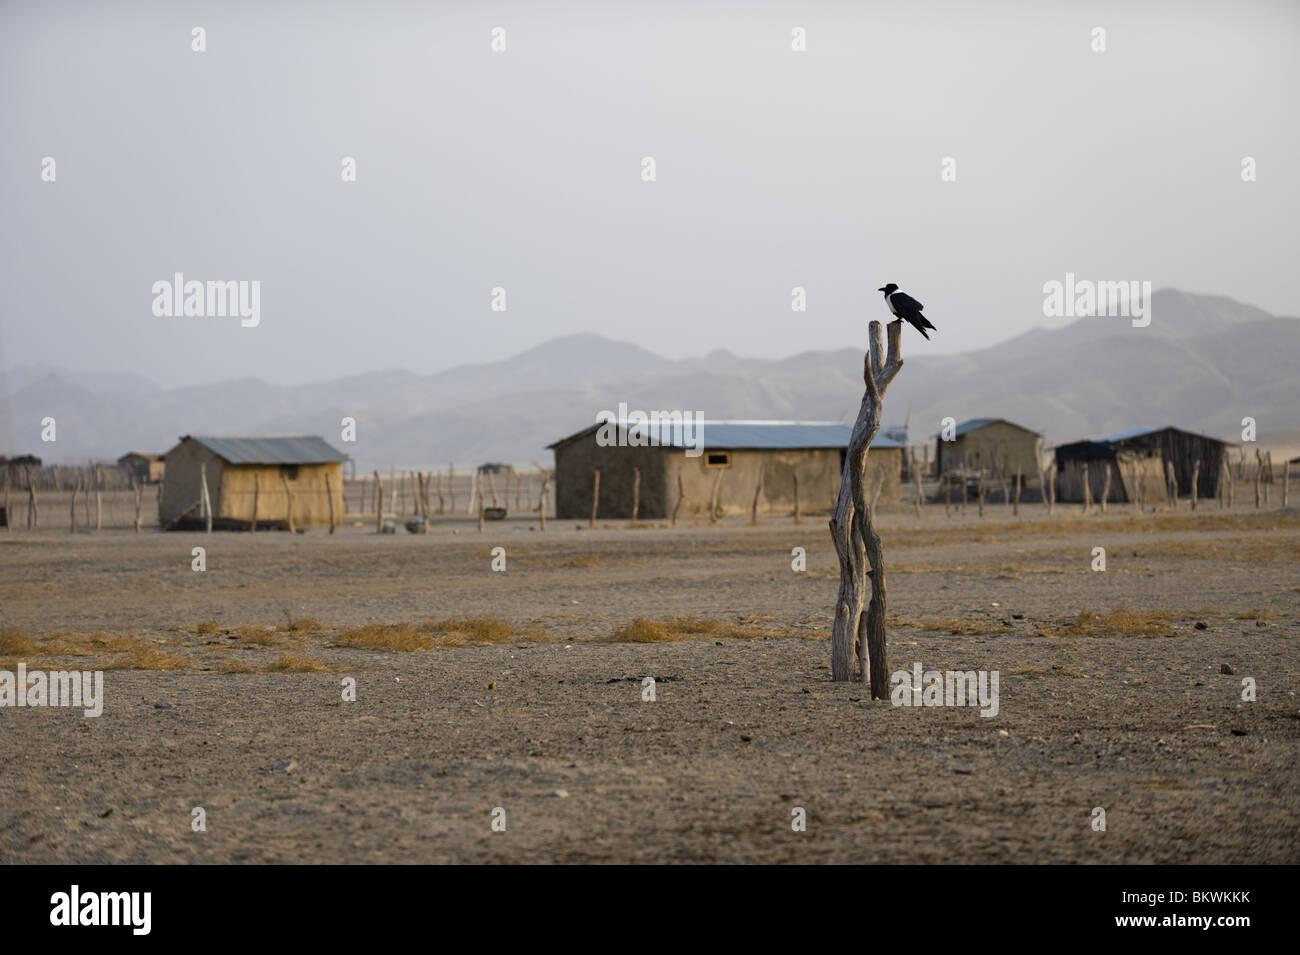 Pueblo Purros, Kaokoland, región Kunene, Namibia. Foto de stock